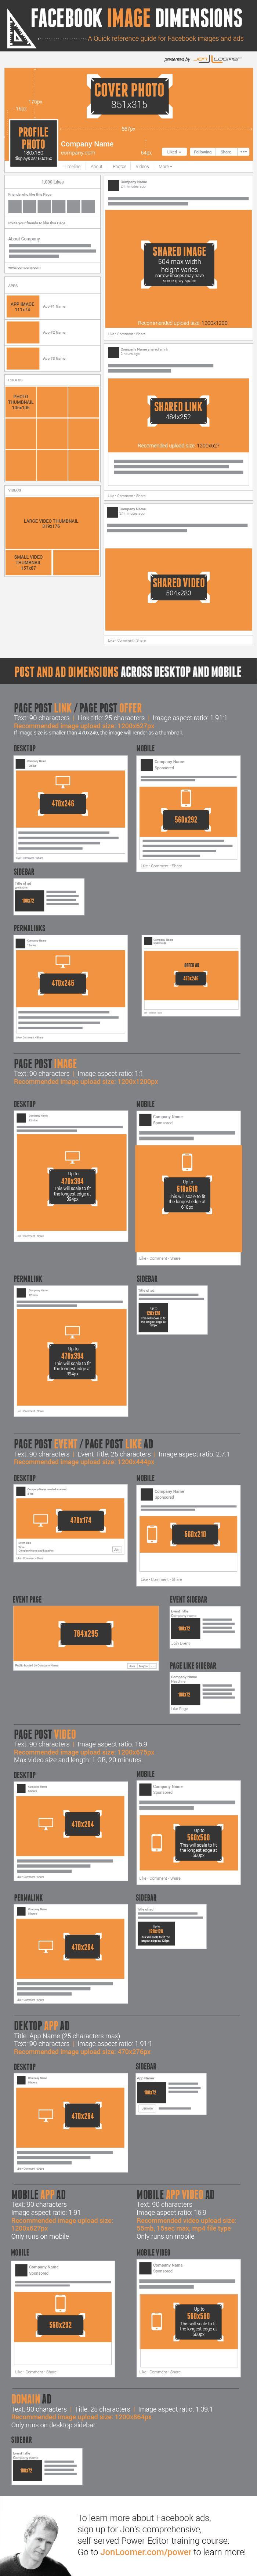 All #Facebook Image #Dimensions: Timeline, Posts, Ads [#Infographic] #socialmedia